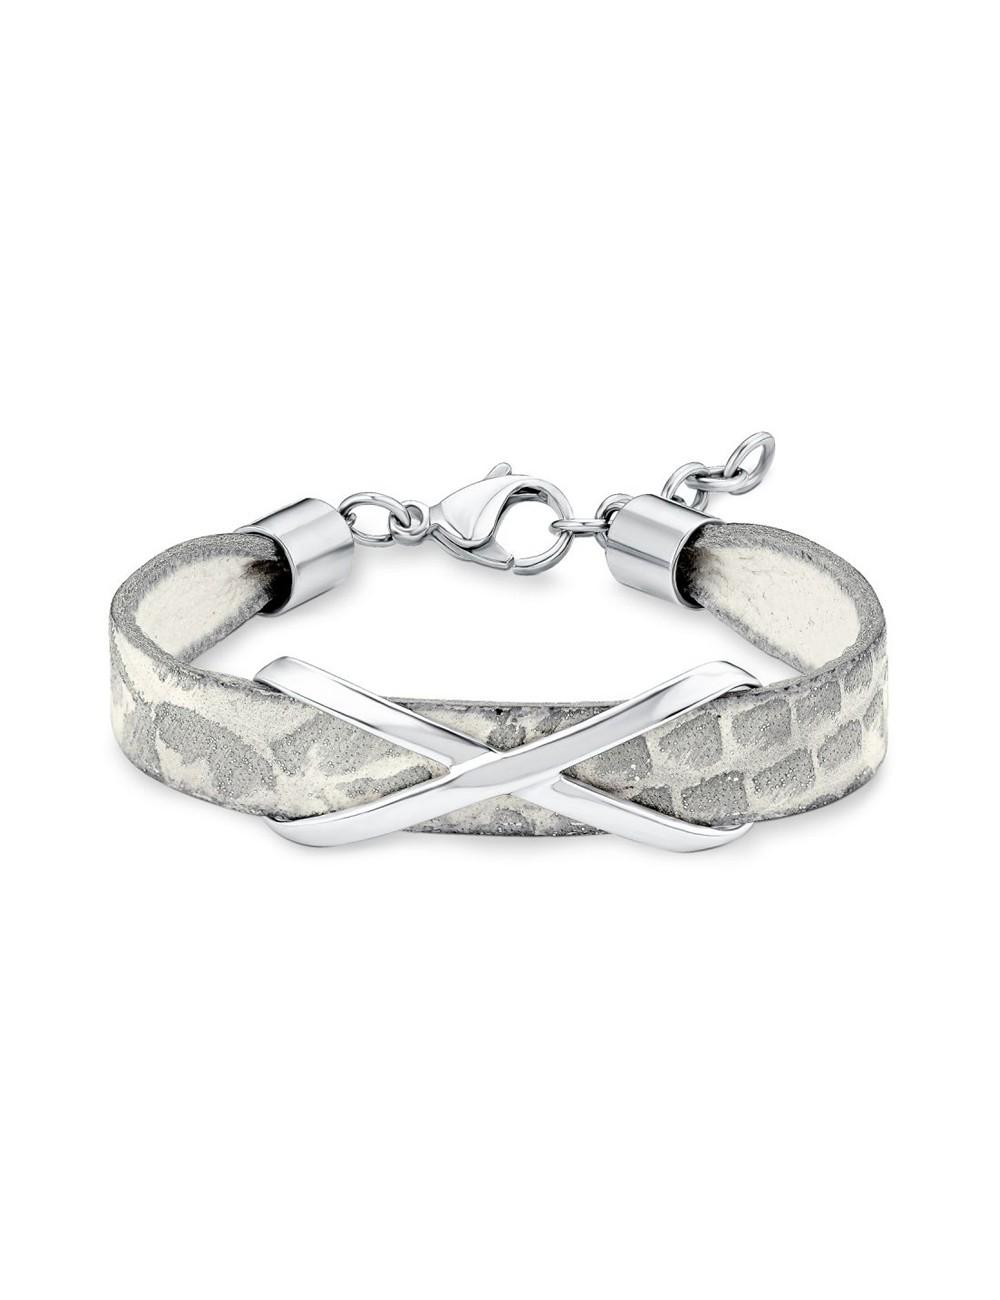 s.Oliver Ladies Bracelet 9024025